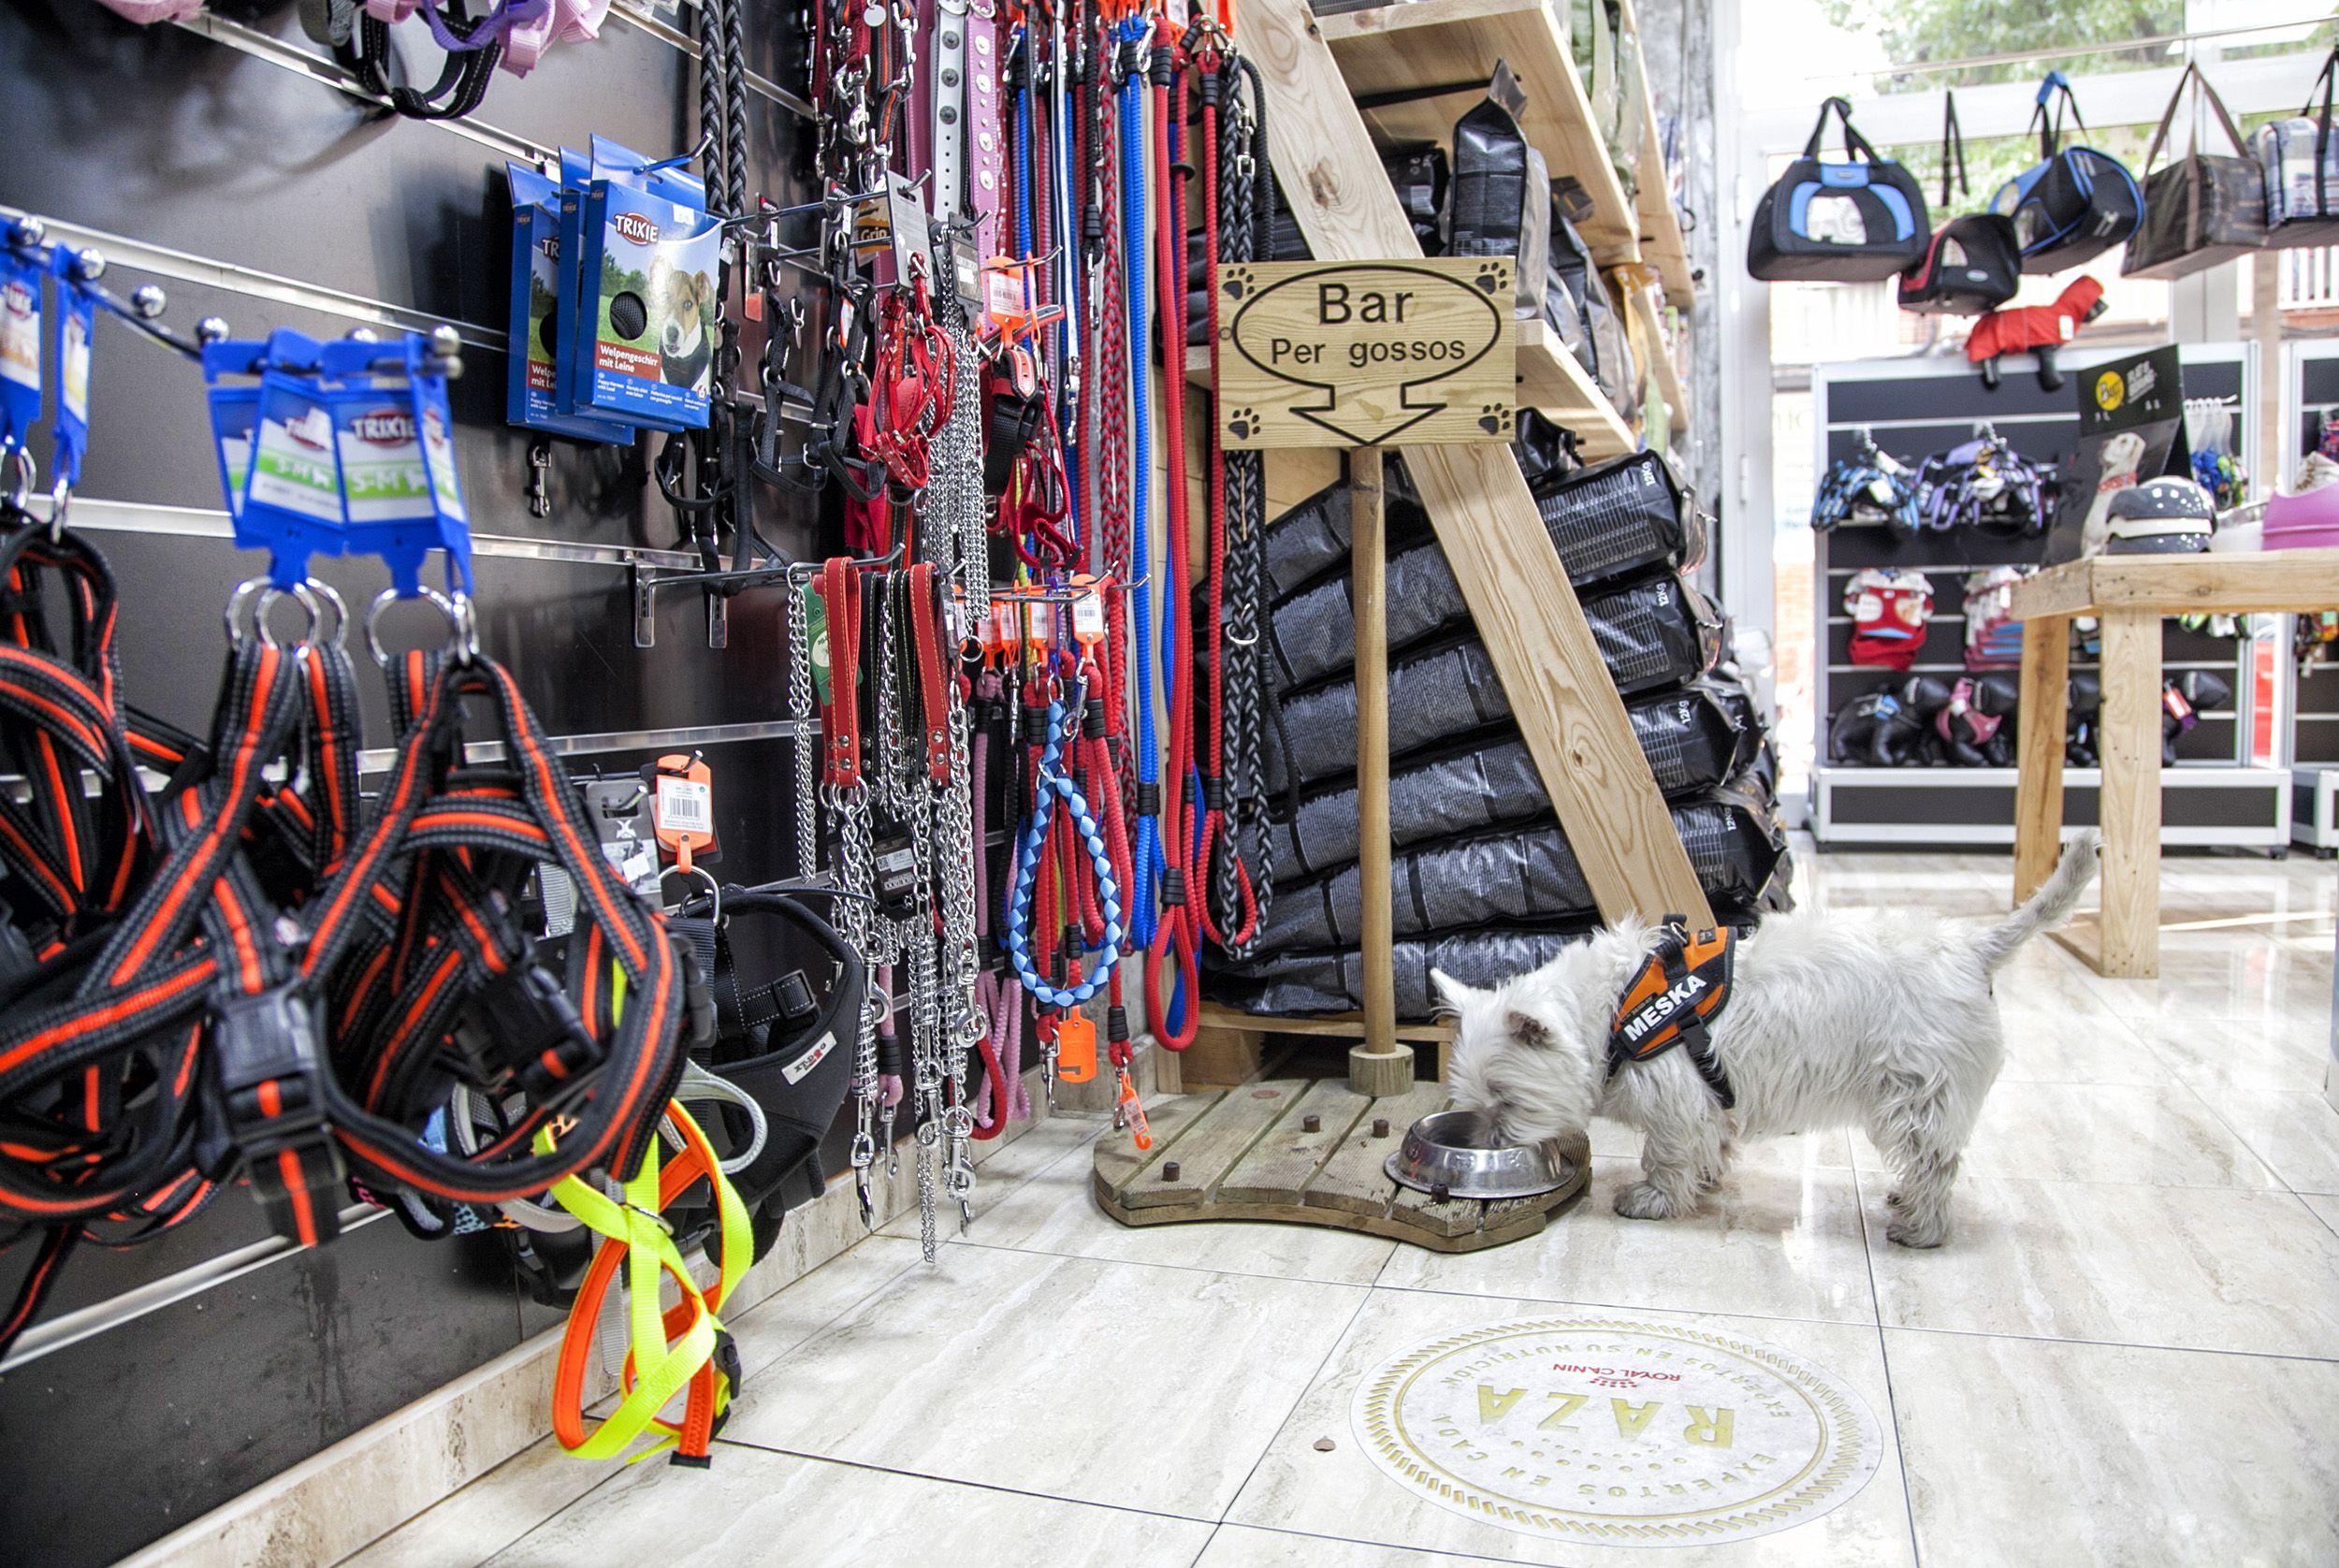 Accesorios para mascotas en Badalona